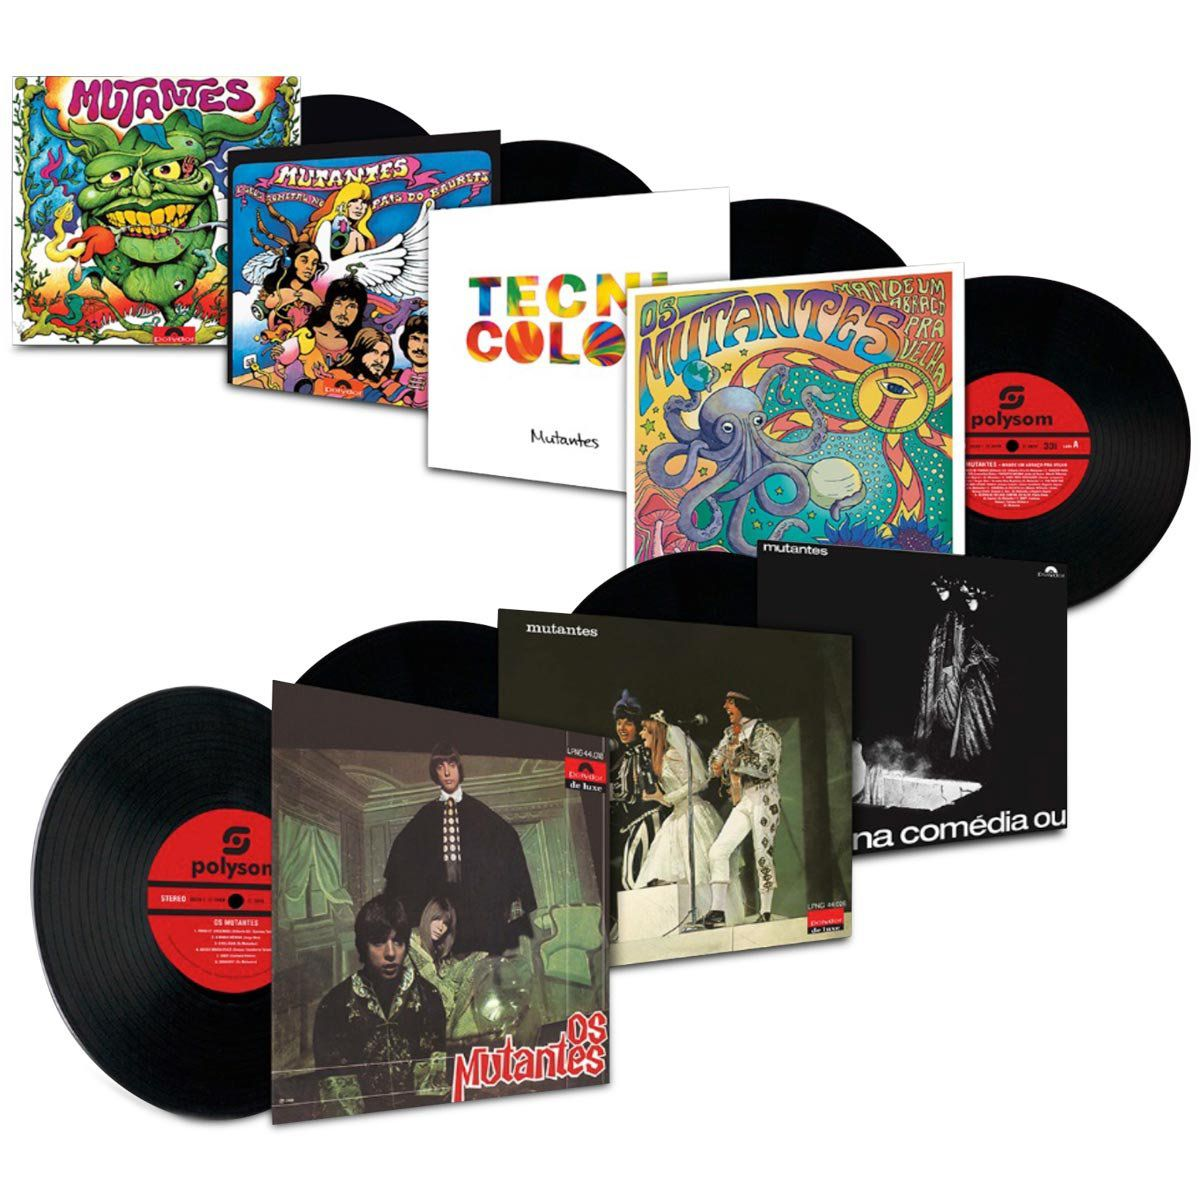 LP Box Os Mutantes  - bandUP Store Marketplace